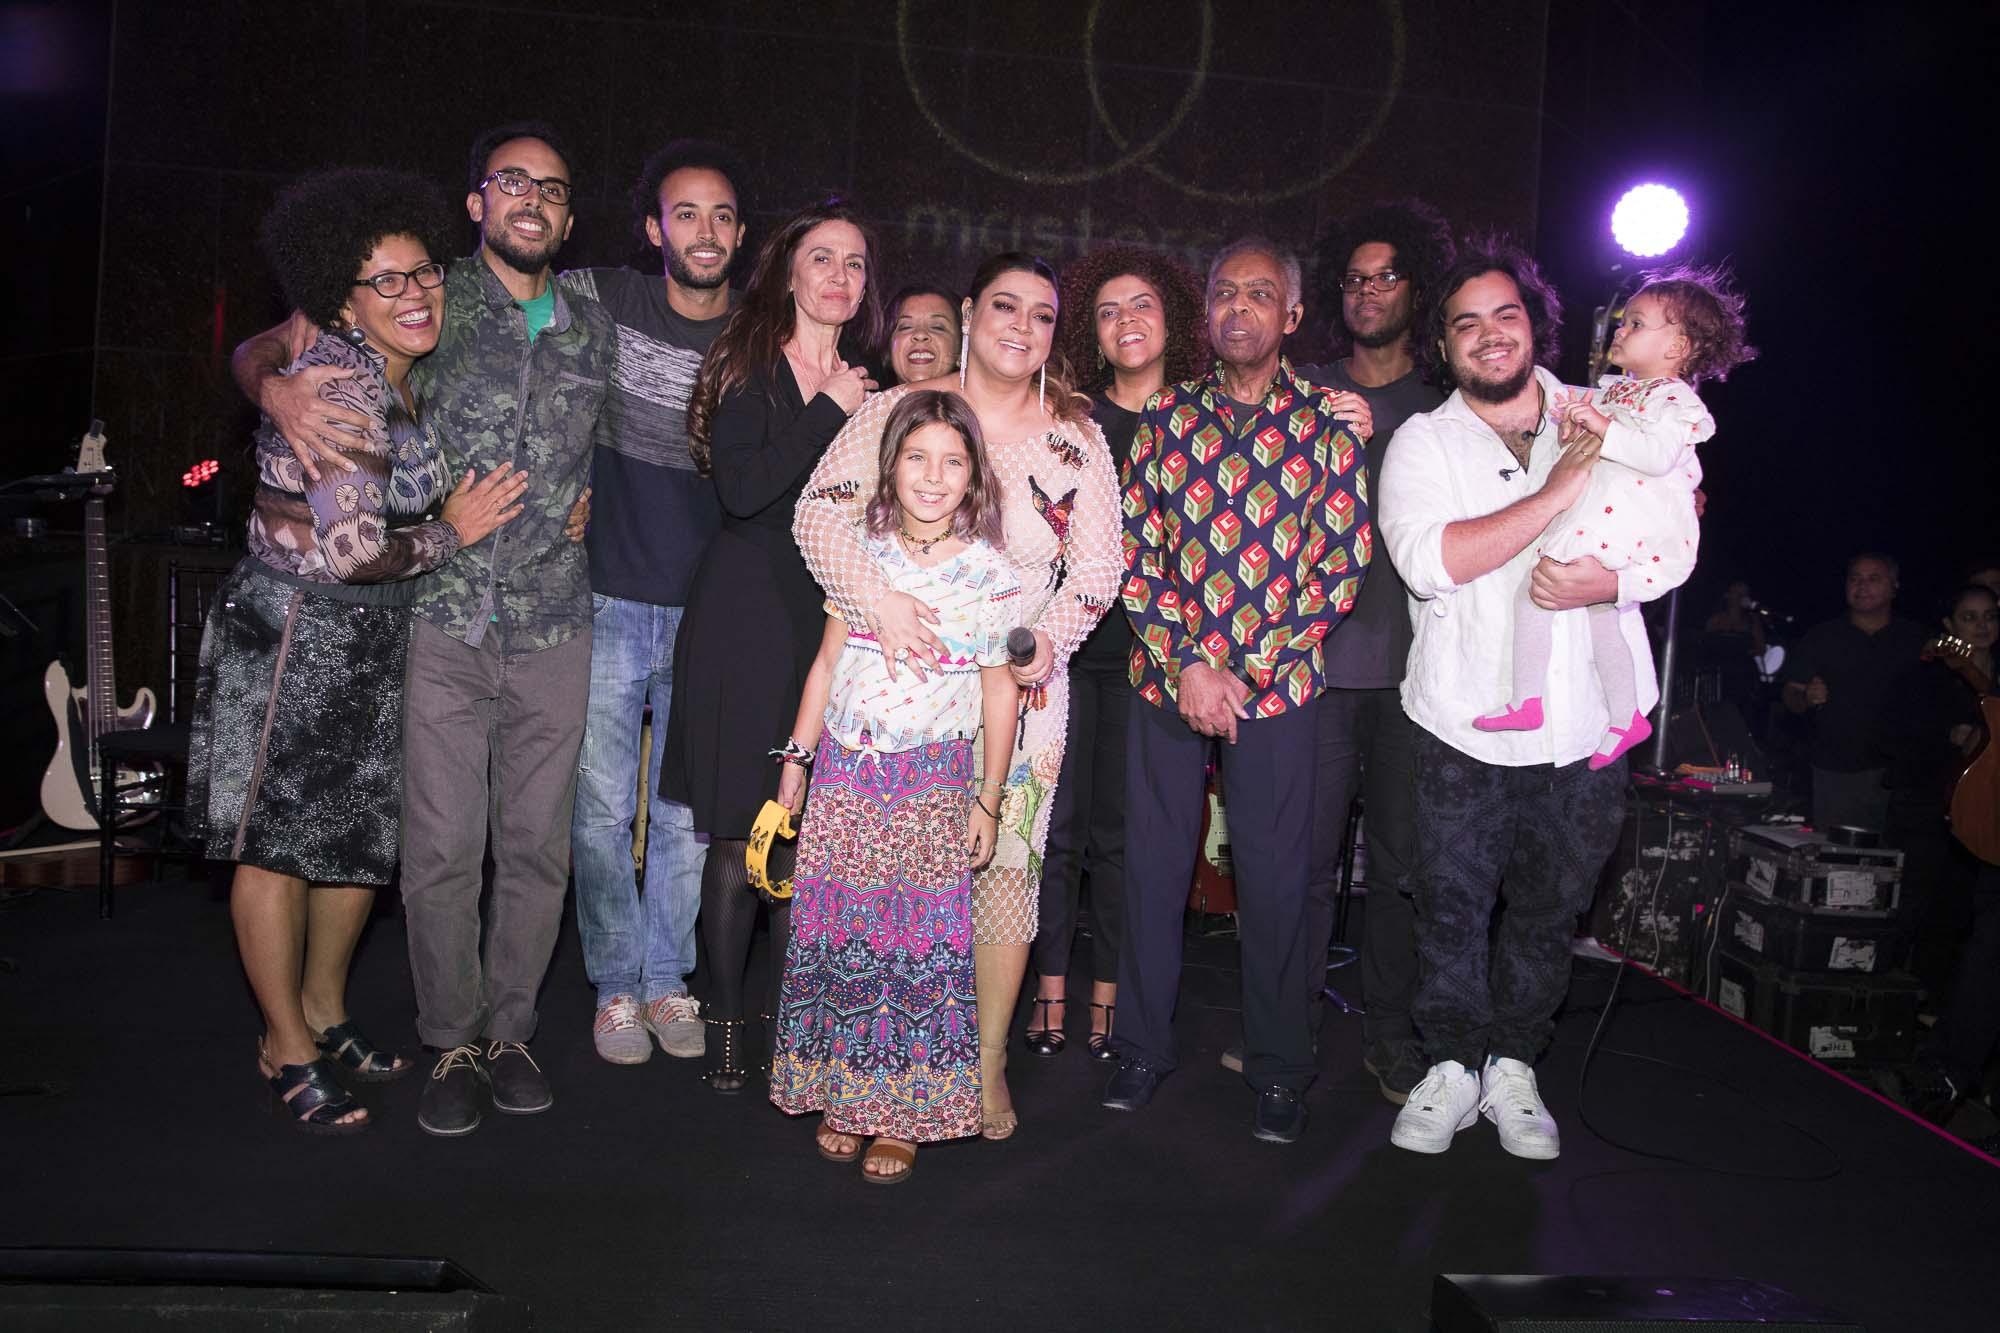 Familia Gil no palco Credito Felipe Panfili (2)